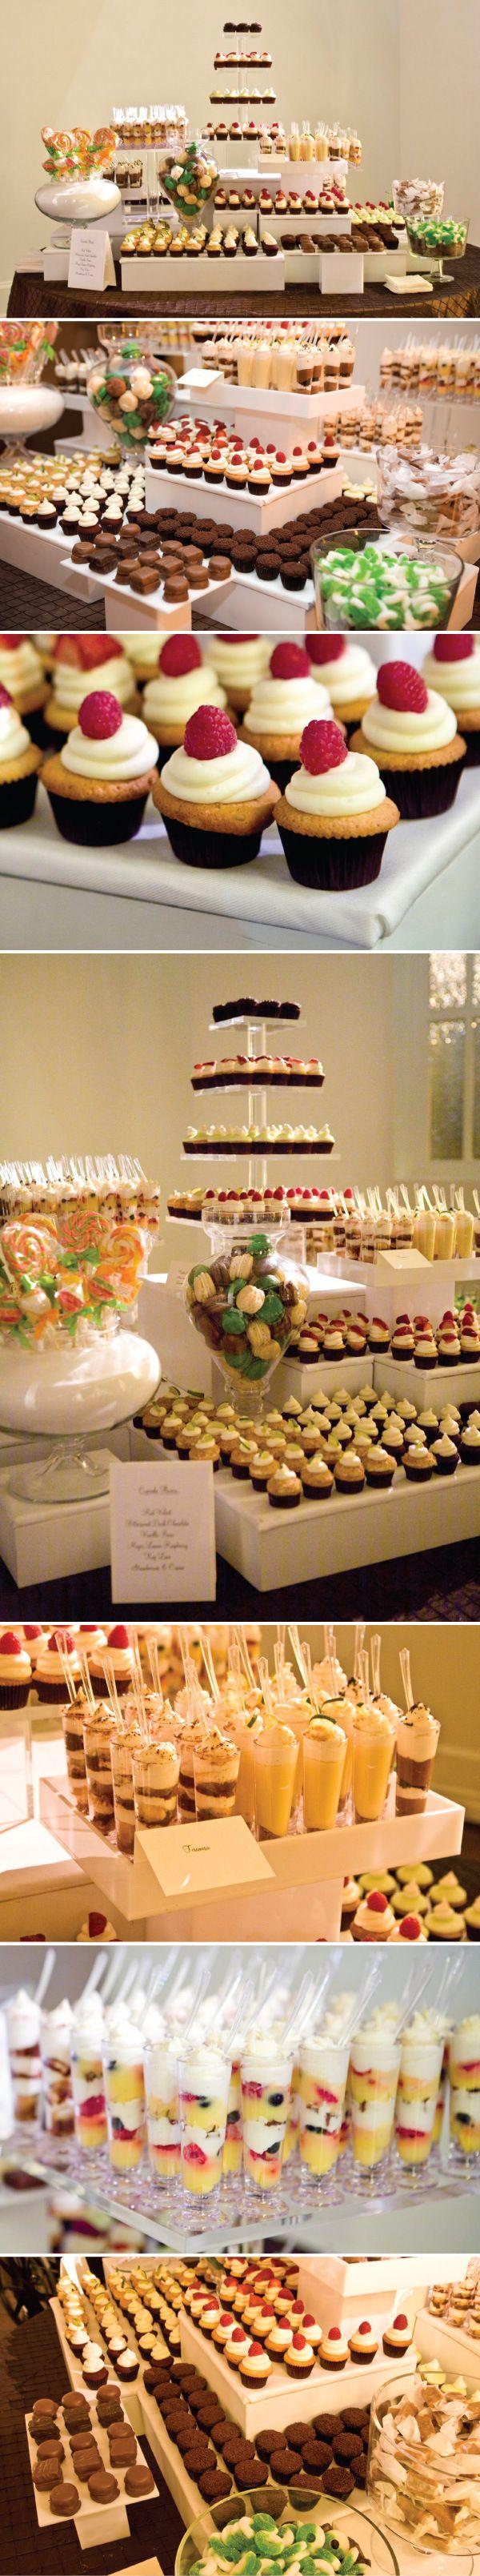 desserts-by-lisa-2